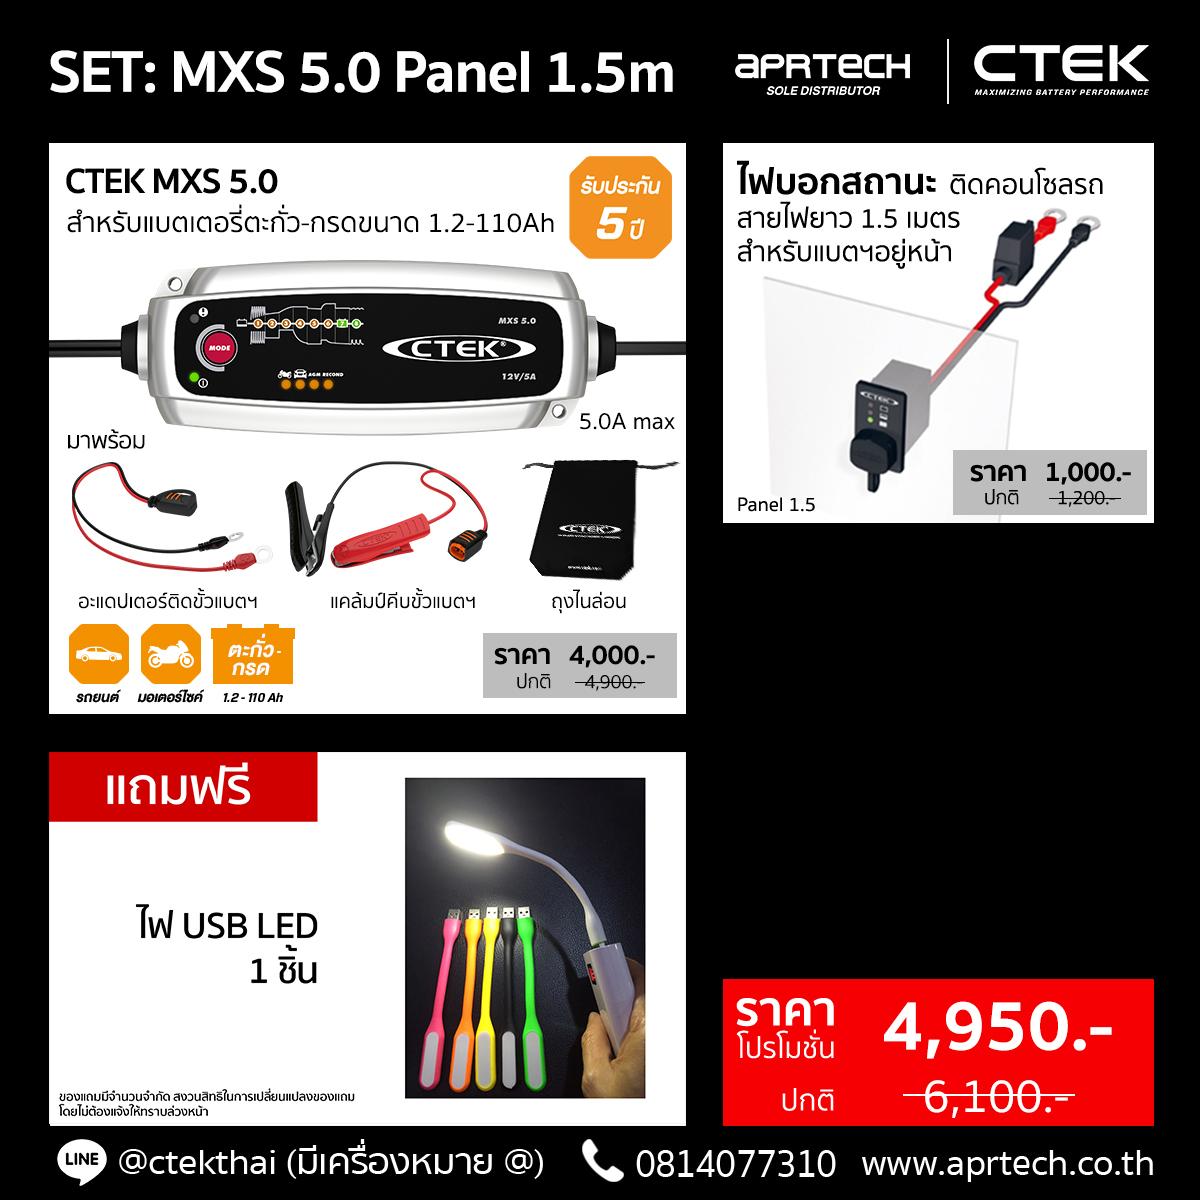 SET MXS 5.0 Panel 1.5m (MXS 5.0 + Indicator Panel 1.5m)